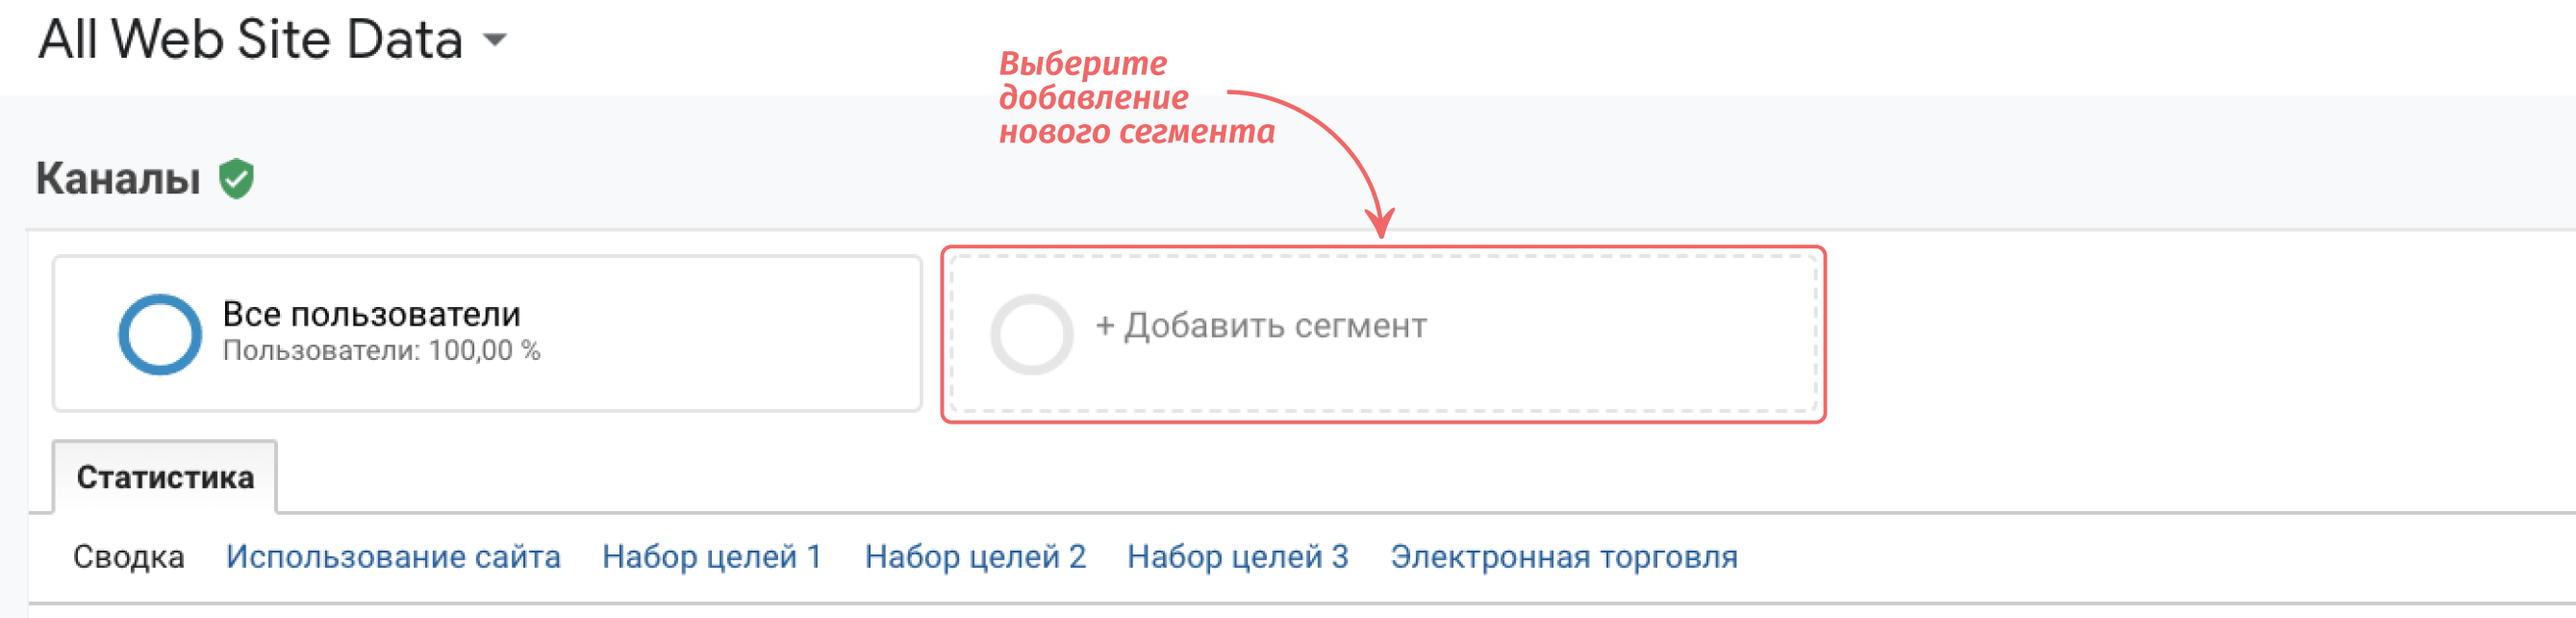 Настройка сегмента Google Analyitcs шаг 1